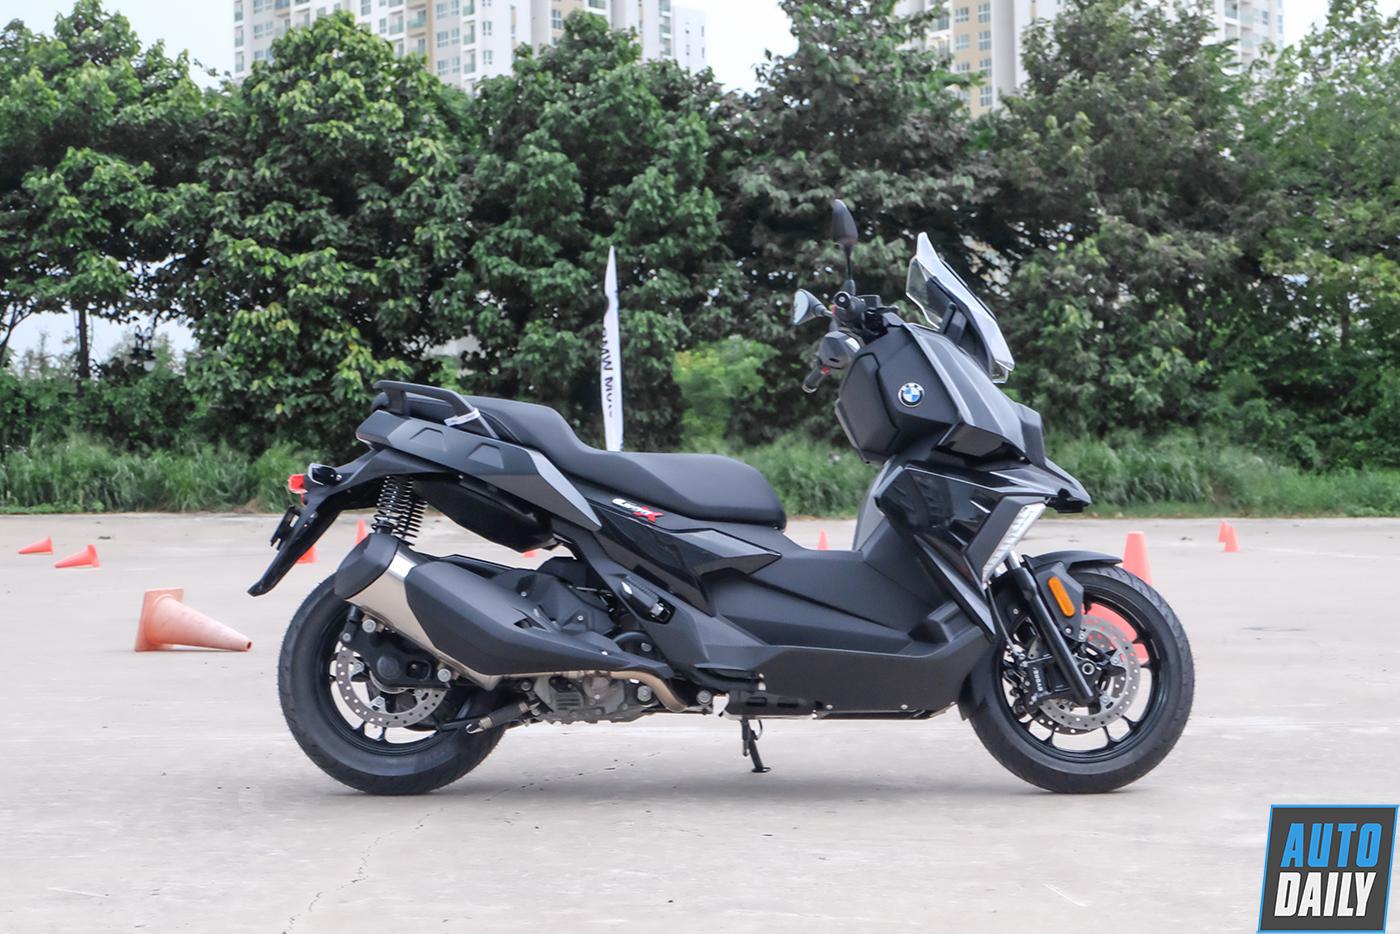 bmw-motorrad-c400x-5.jpg